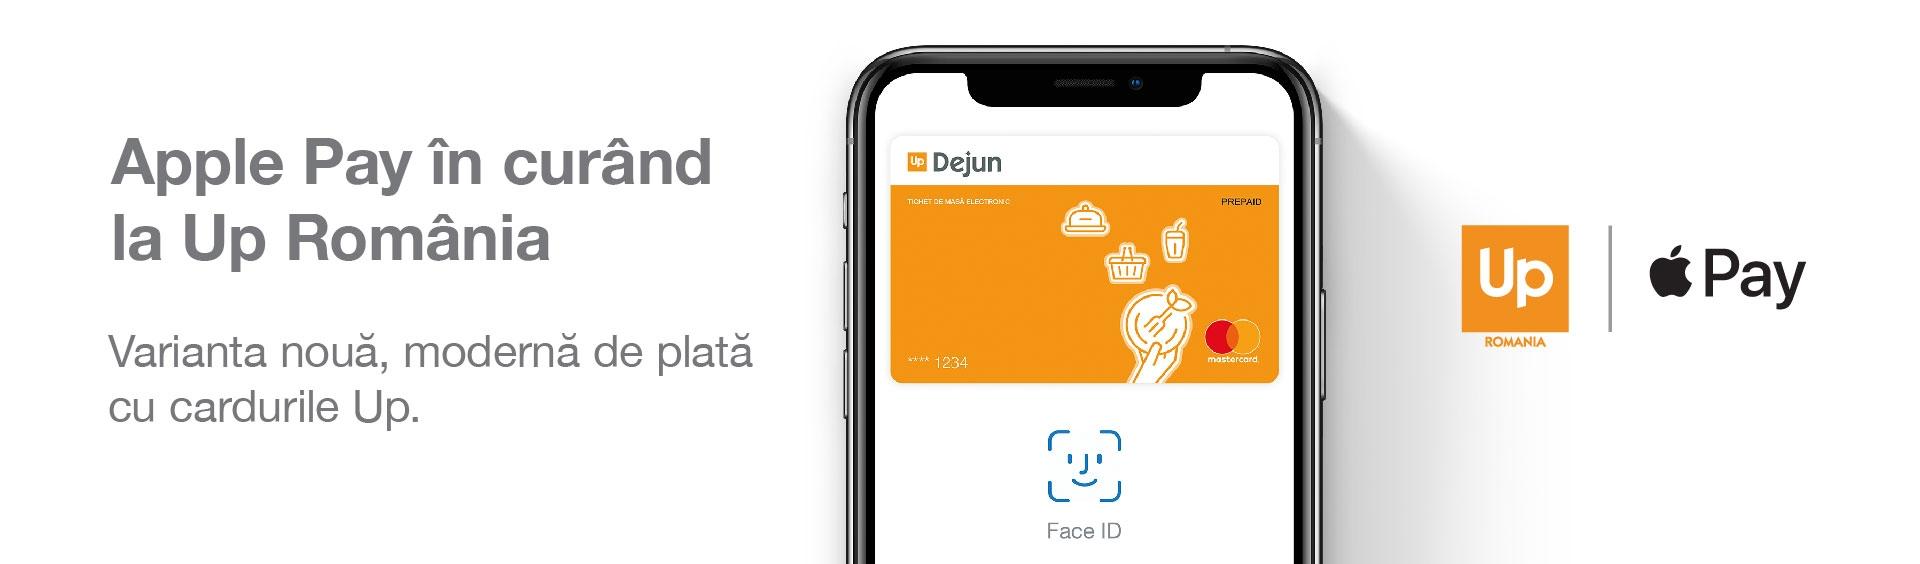 Apple Pay la Up Romania